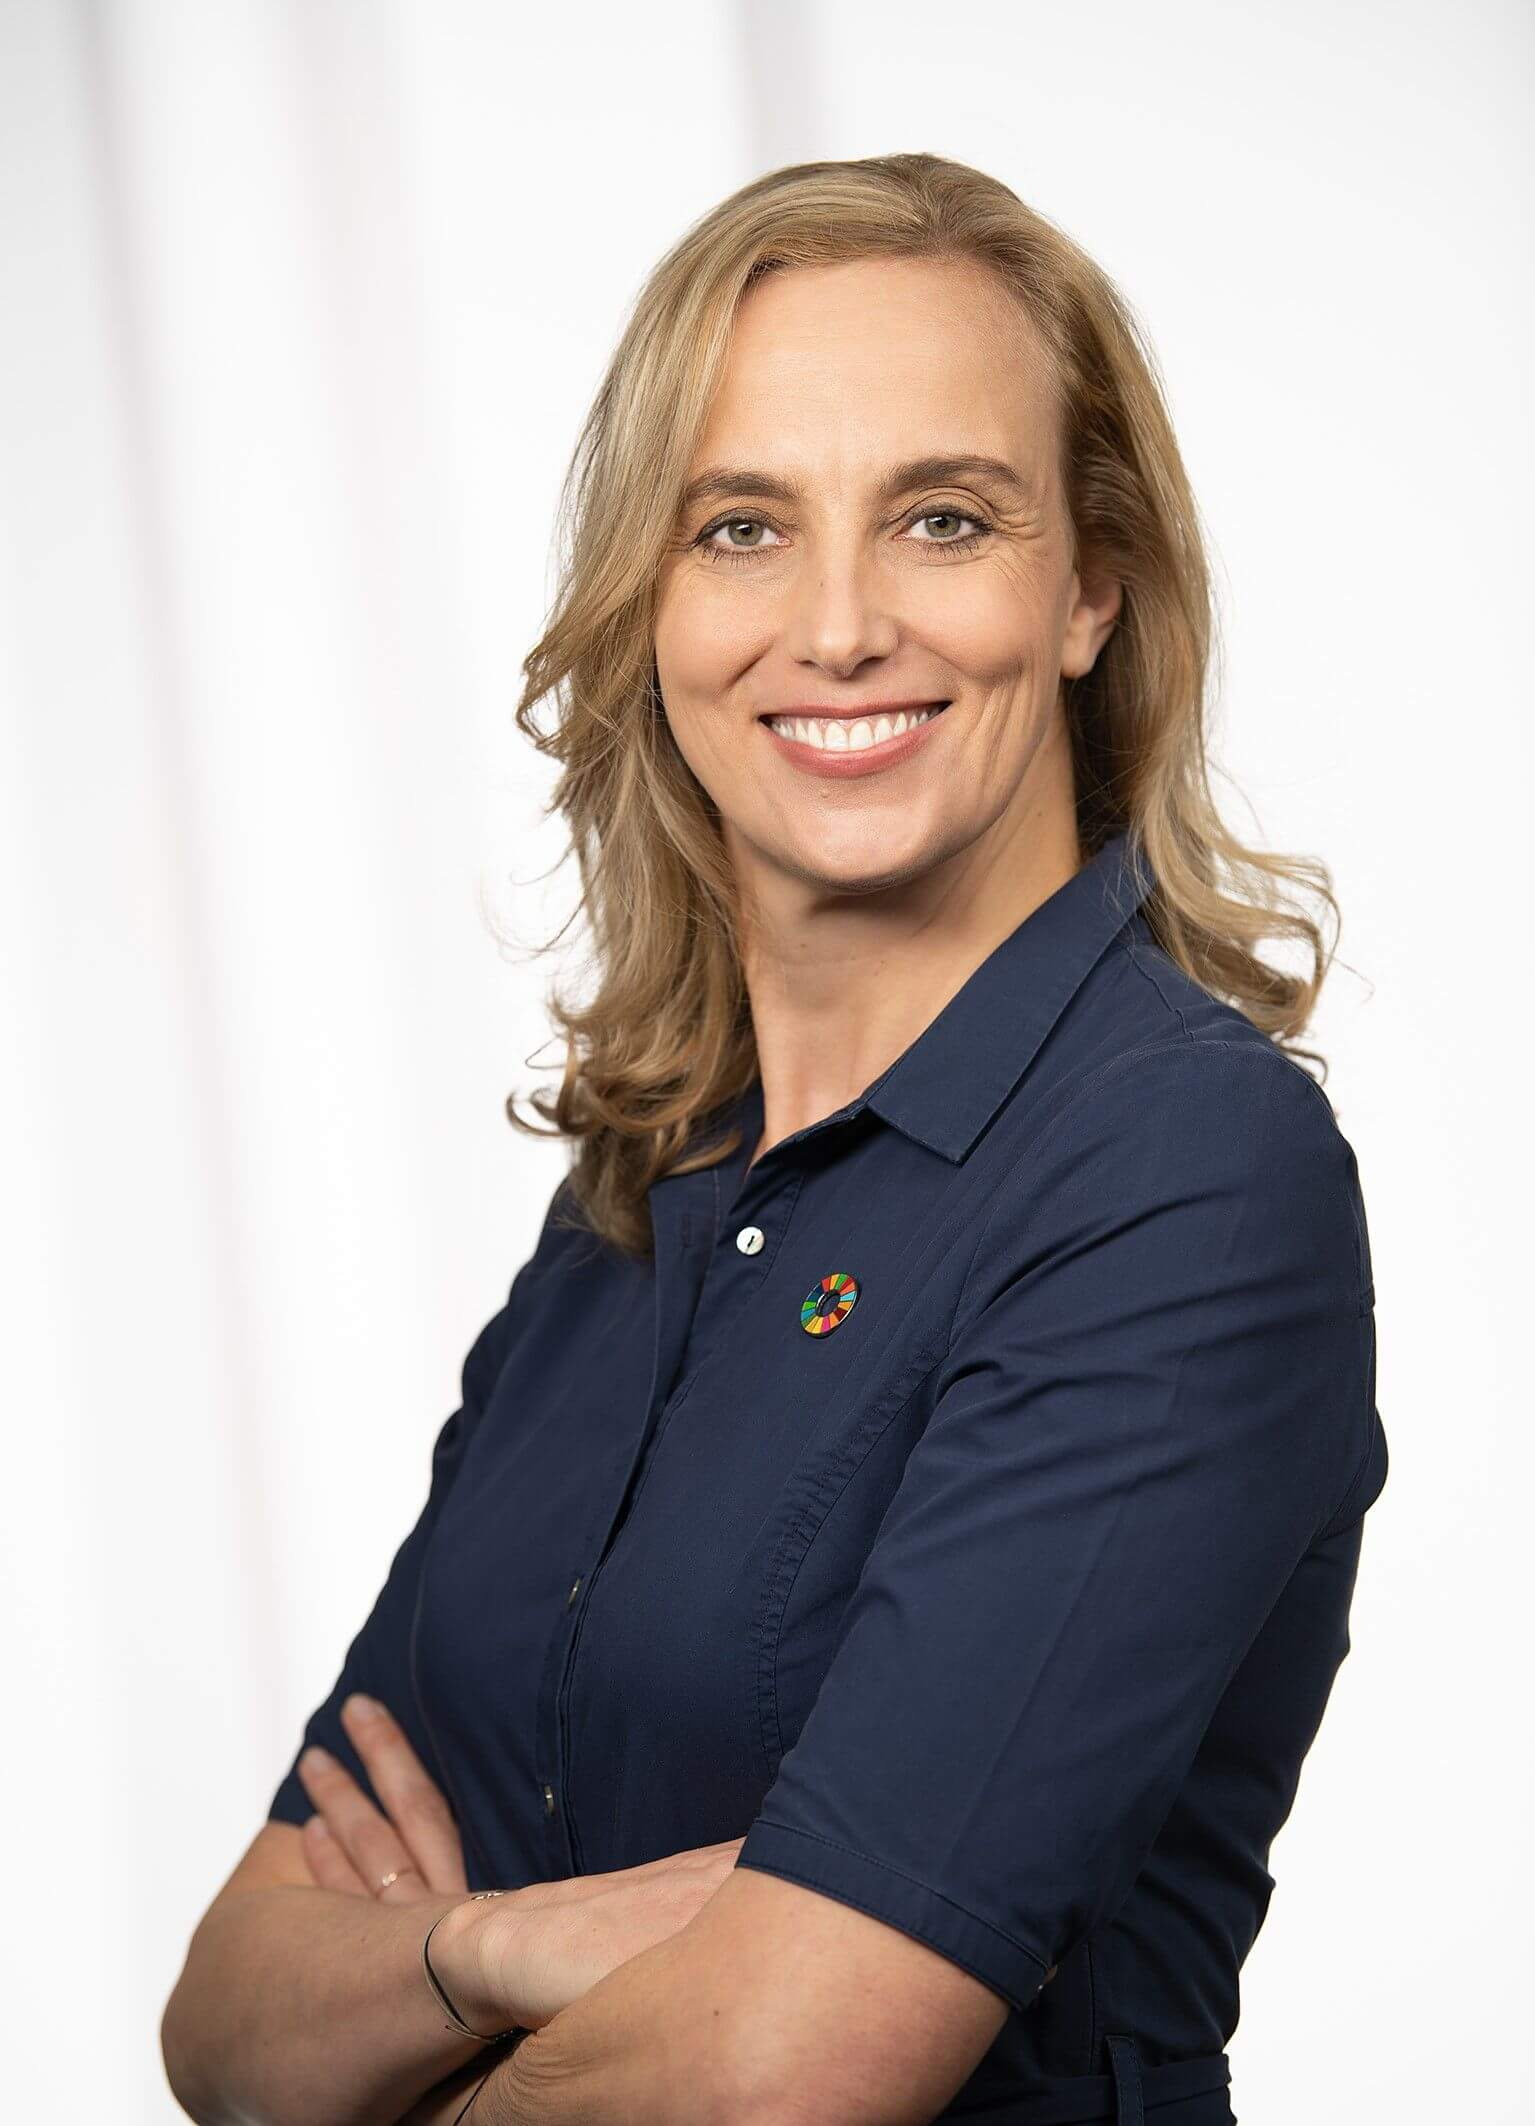 Daniela Knieling